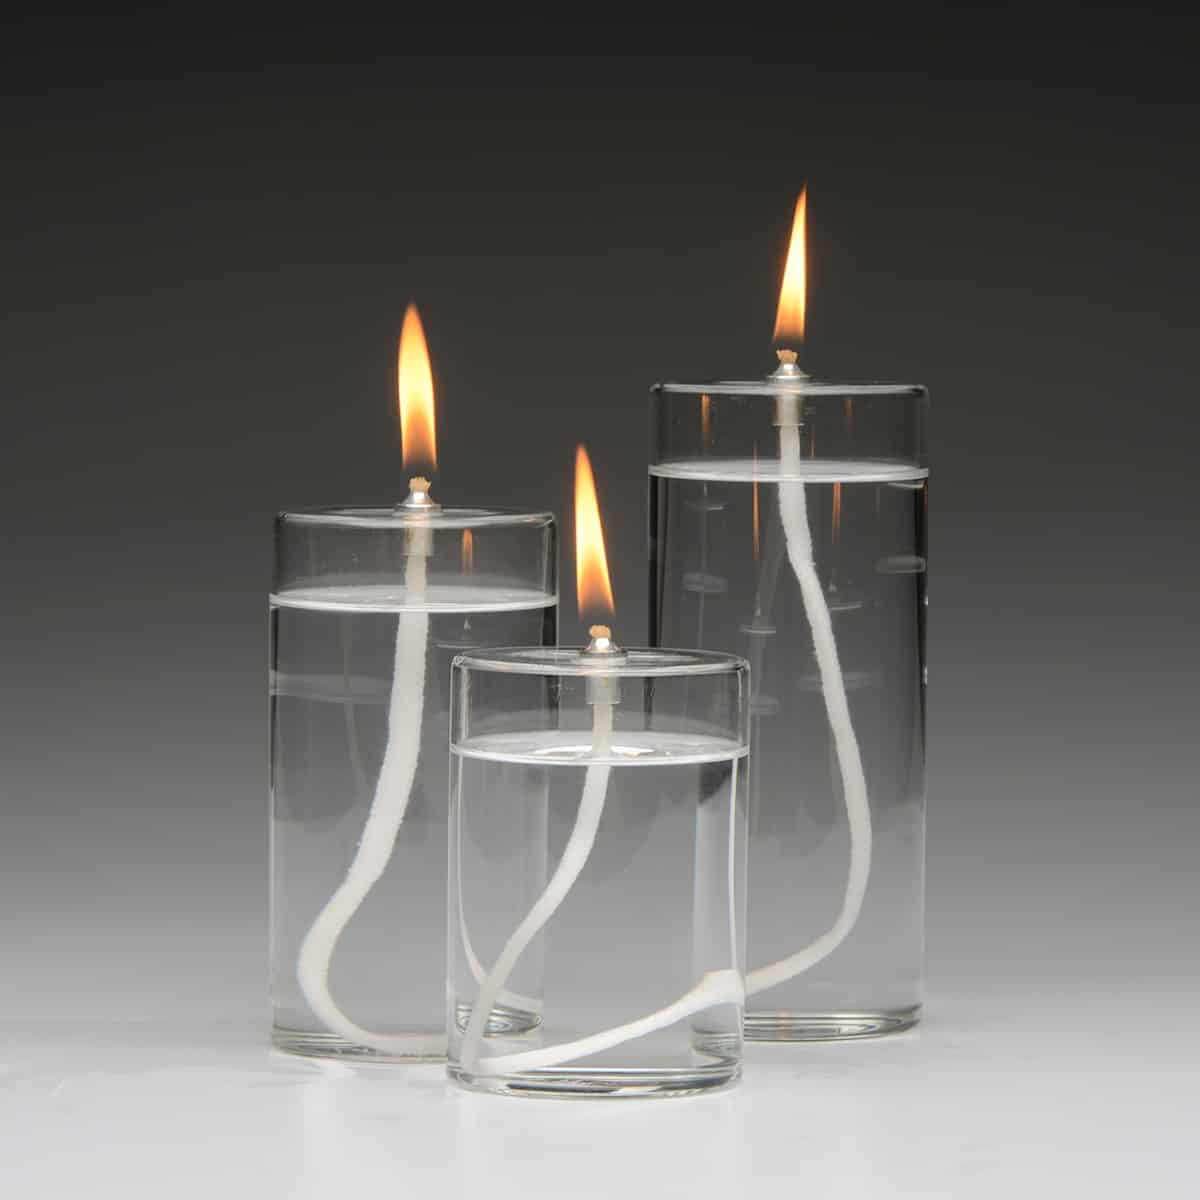 Firefly Refillable Pillar Candles Oil